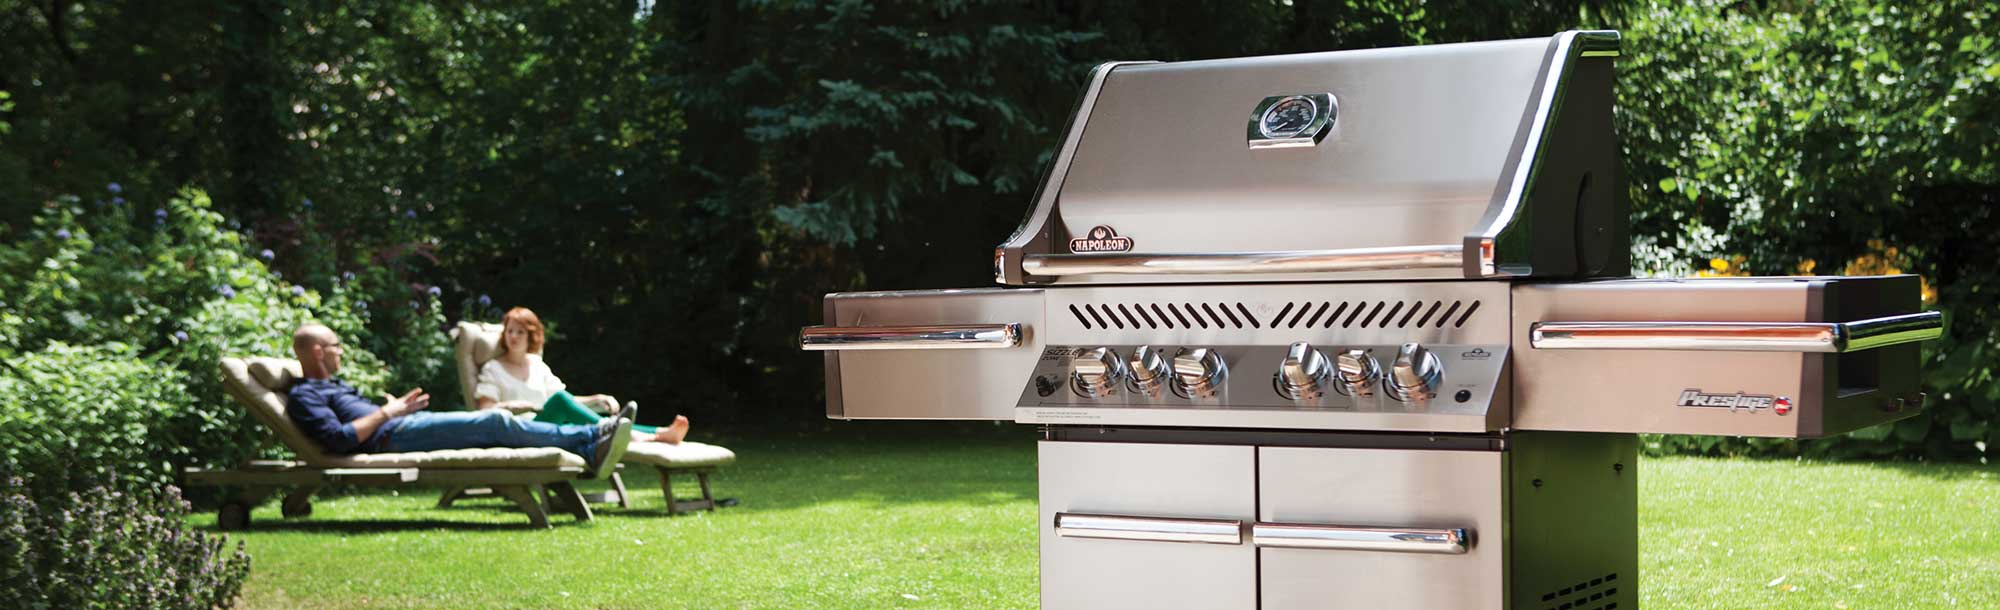 napoleon-grills-slide